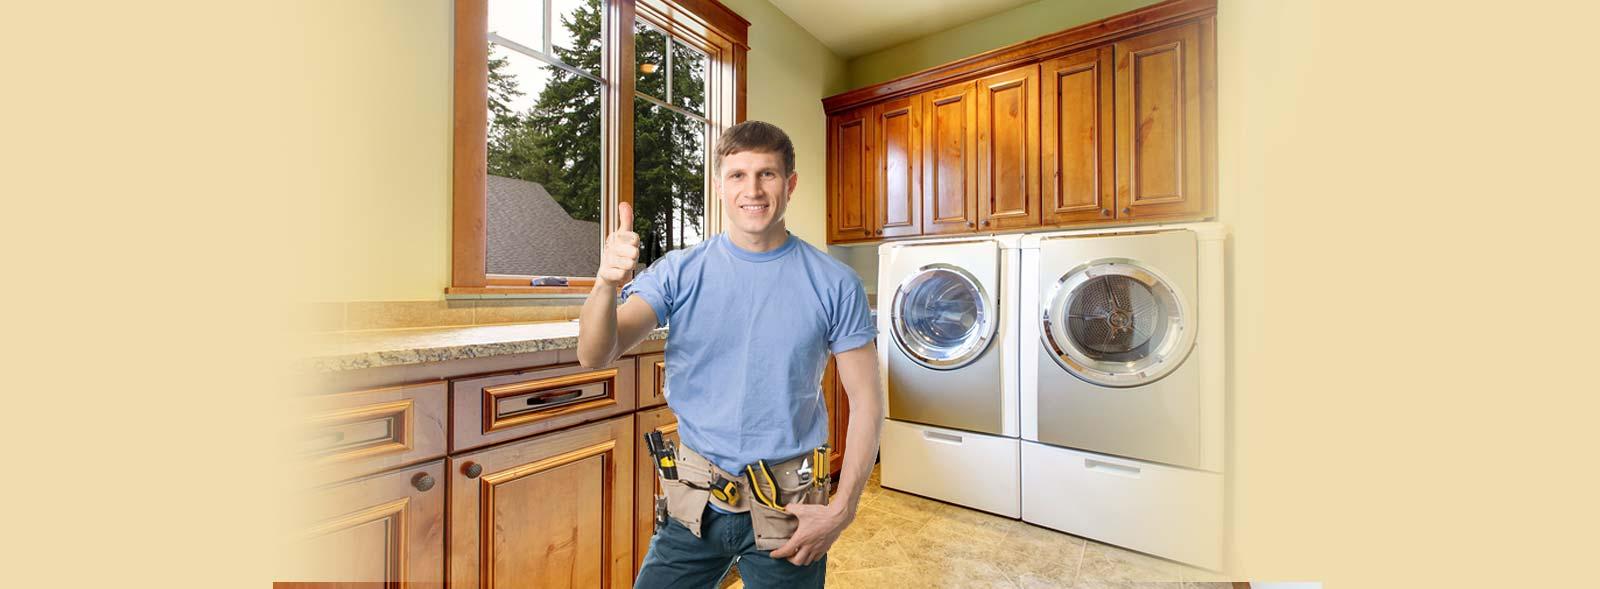 Home Appliance Service All Brands Appliance Boise Appliances Sales Repair Service